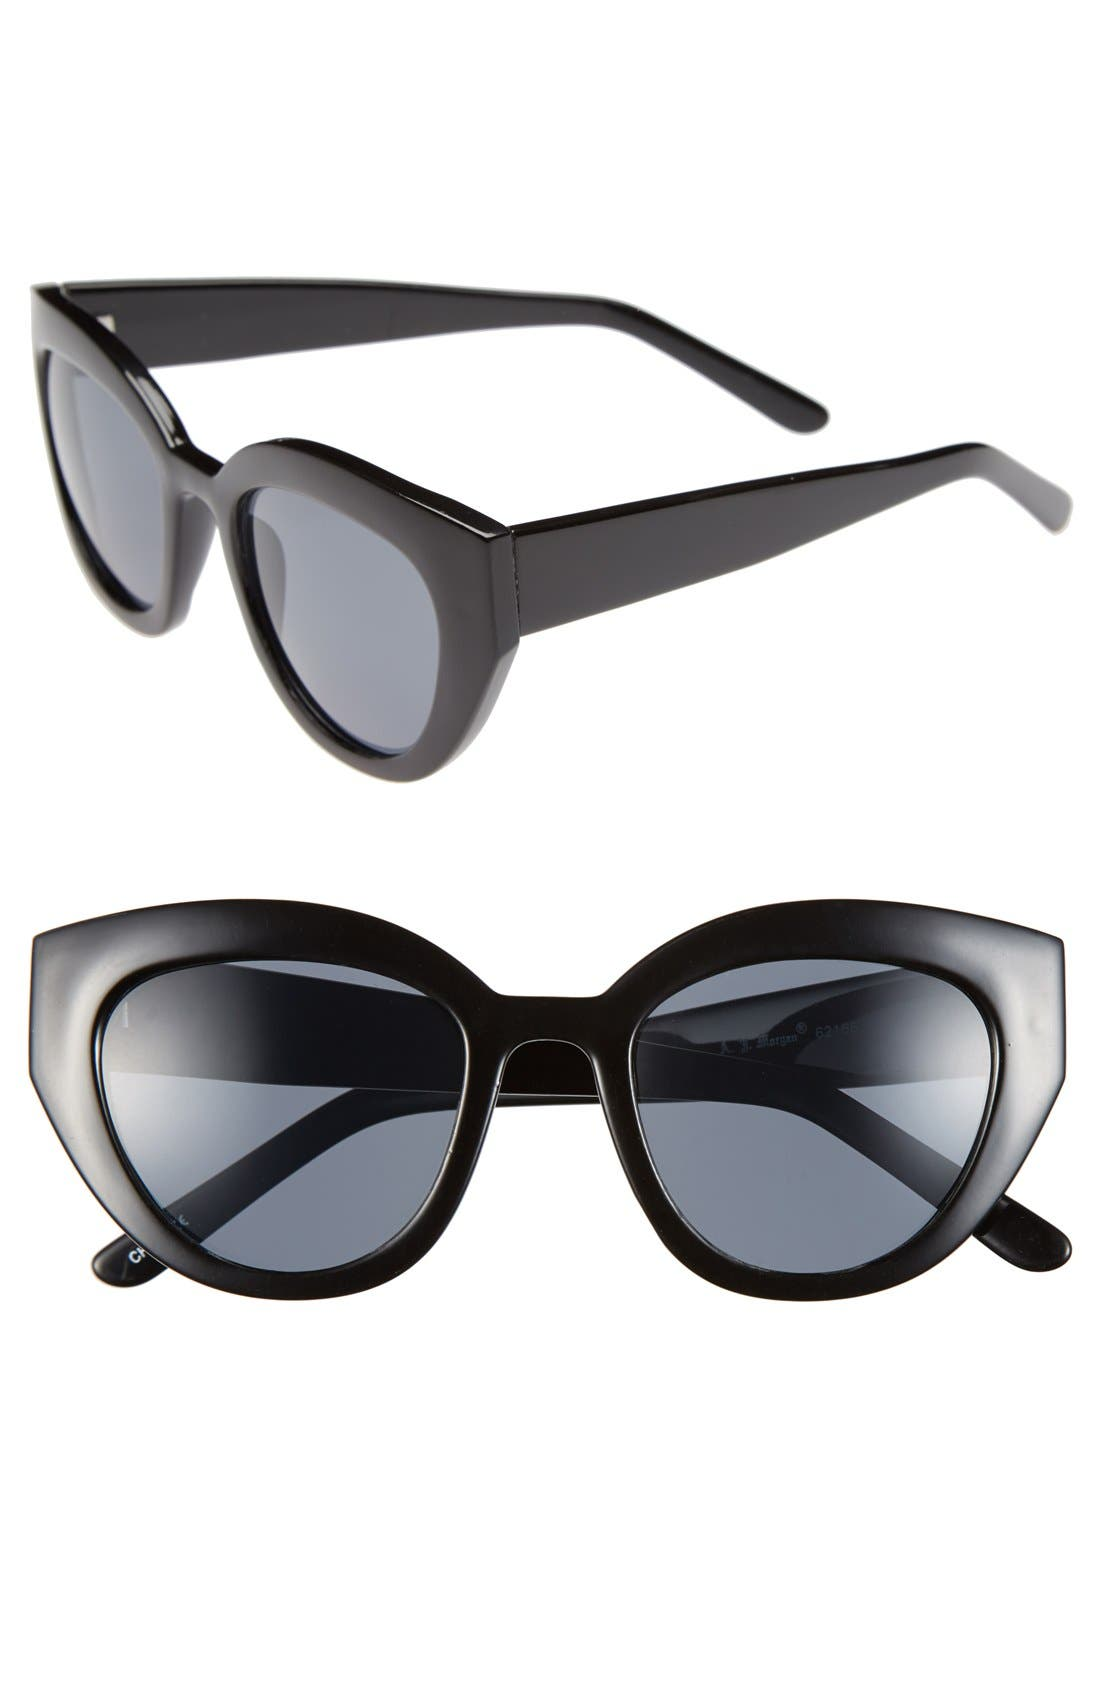 Alternate Image 1 Selected - A.J. Morgan 'Maybe' 47mm Sunglasses